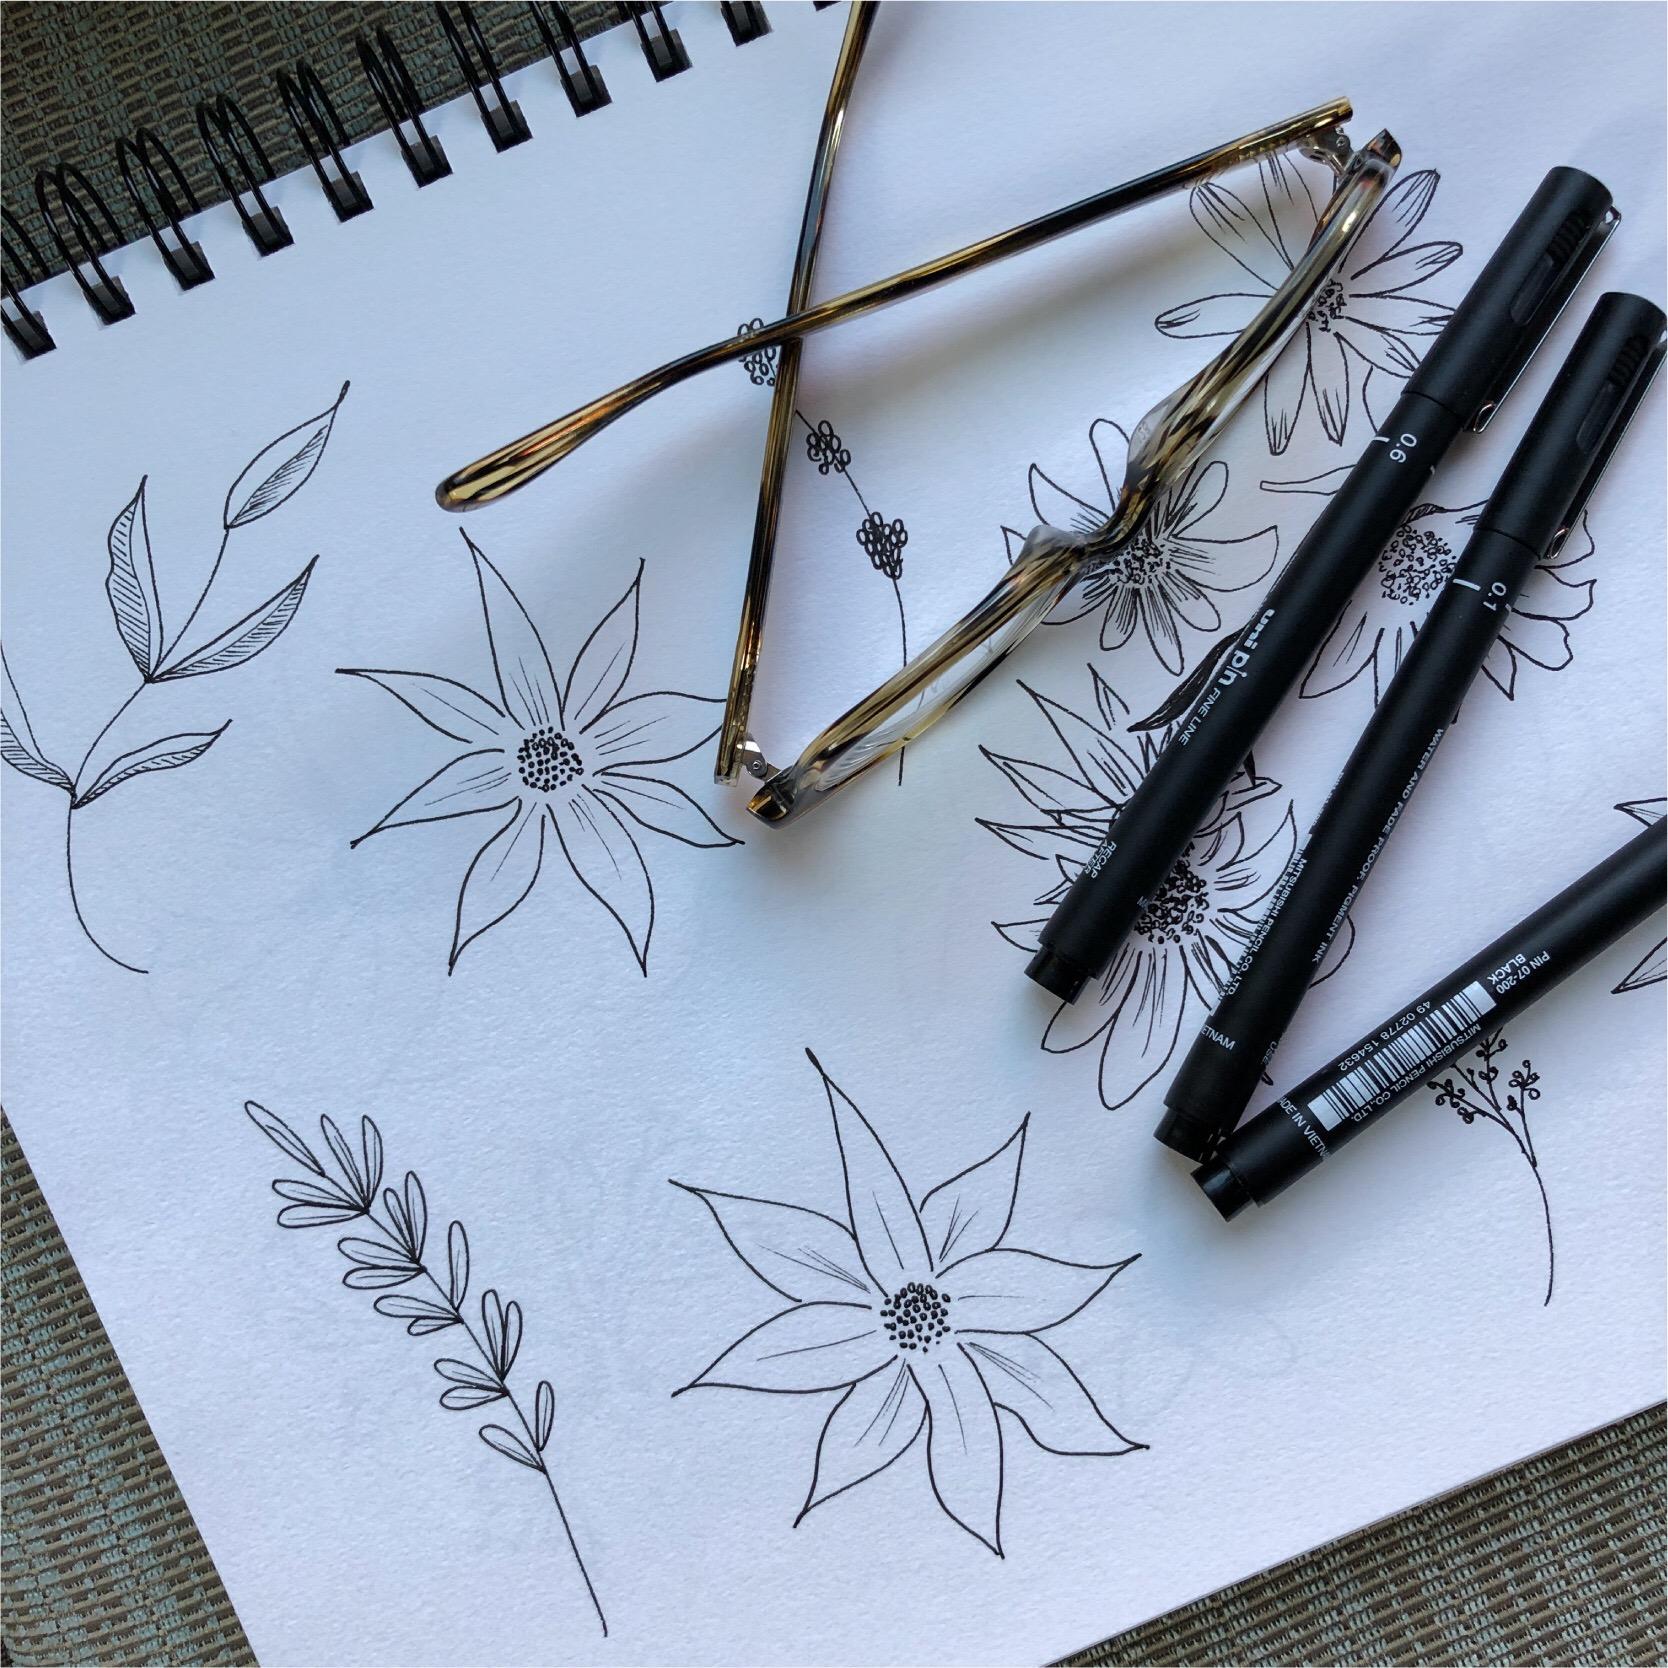 ink-sketches_Anne-LaFollette.jpg